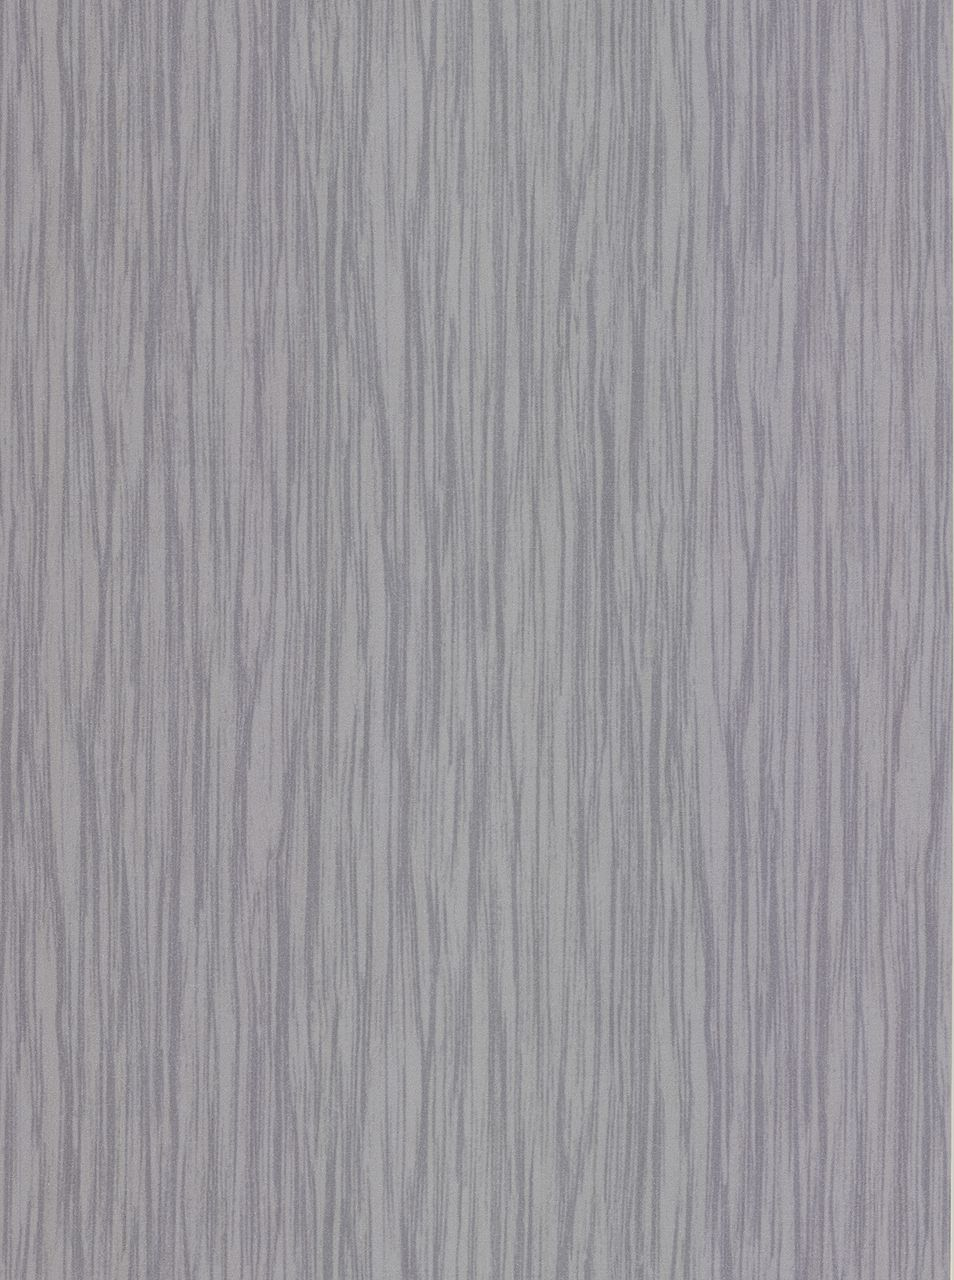 Bellissimo Vi By Brewster 2768 95566 Murano Grey Vertical Texture Wallpaper Textured Wallpaper Brewster Texture